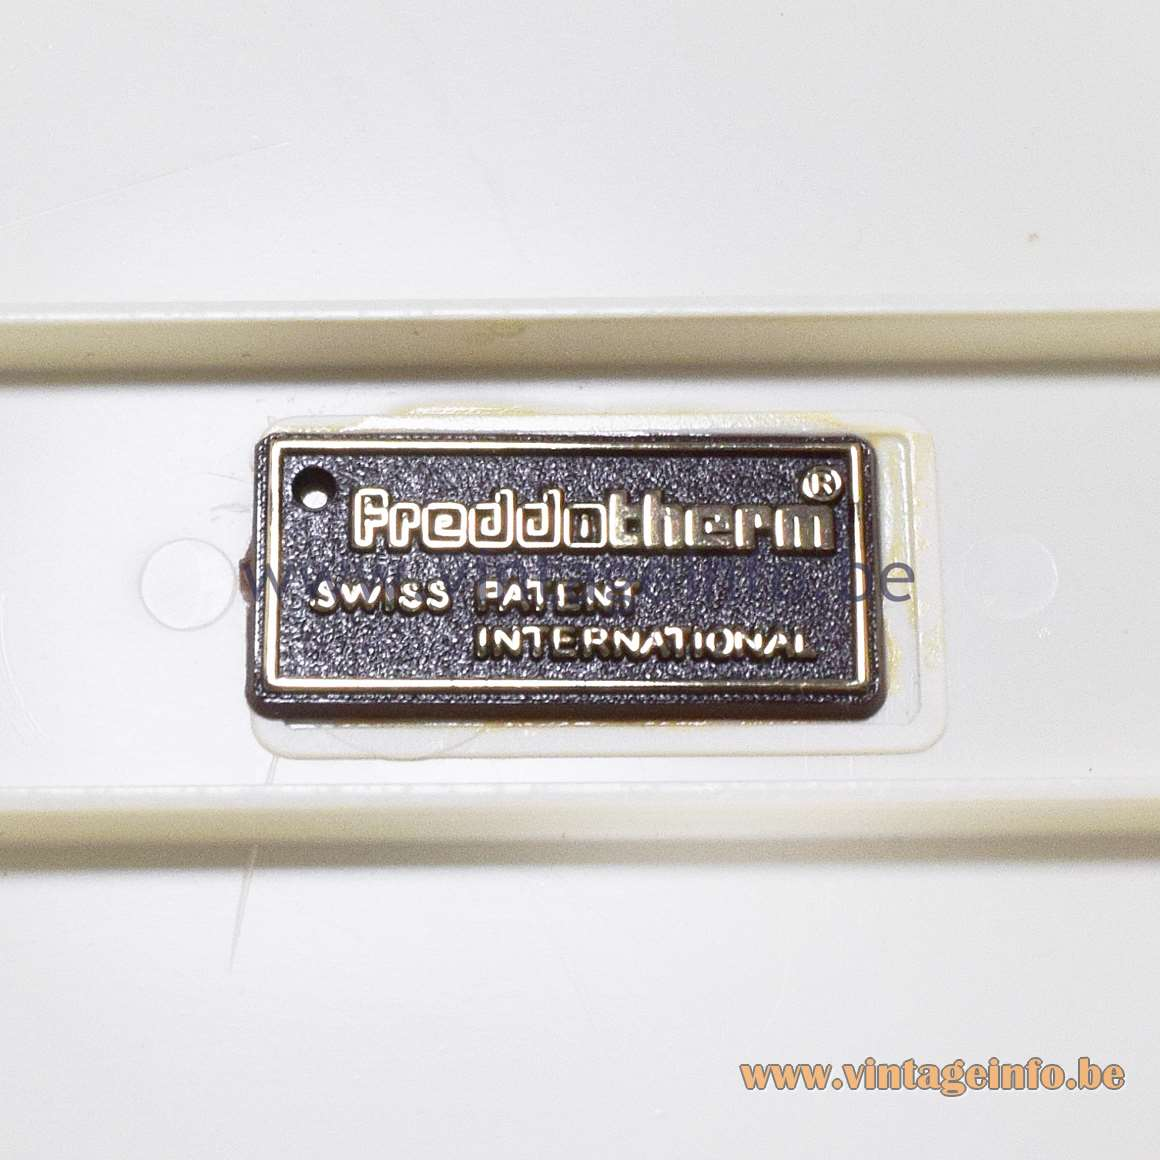 Freddotherm label - Swiss Patent International